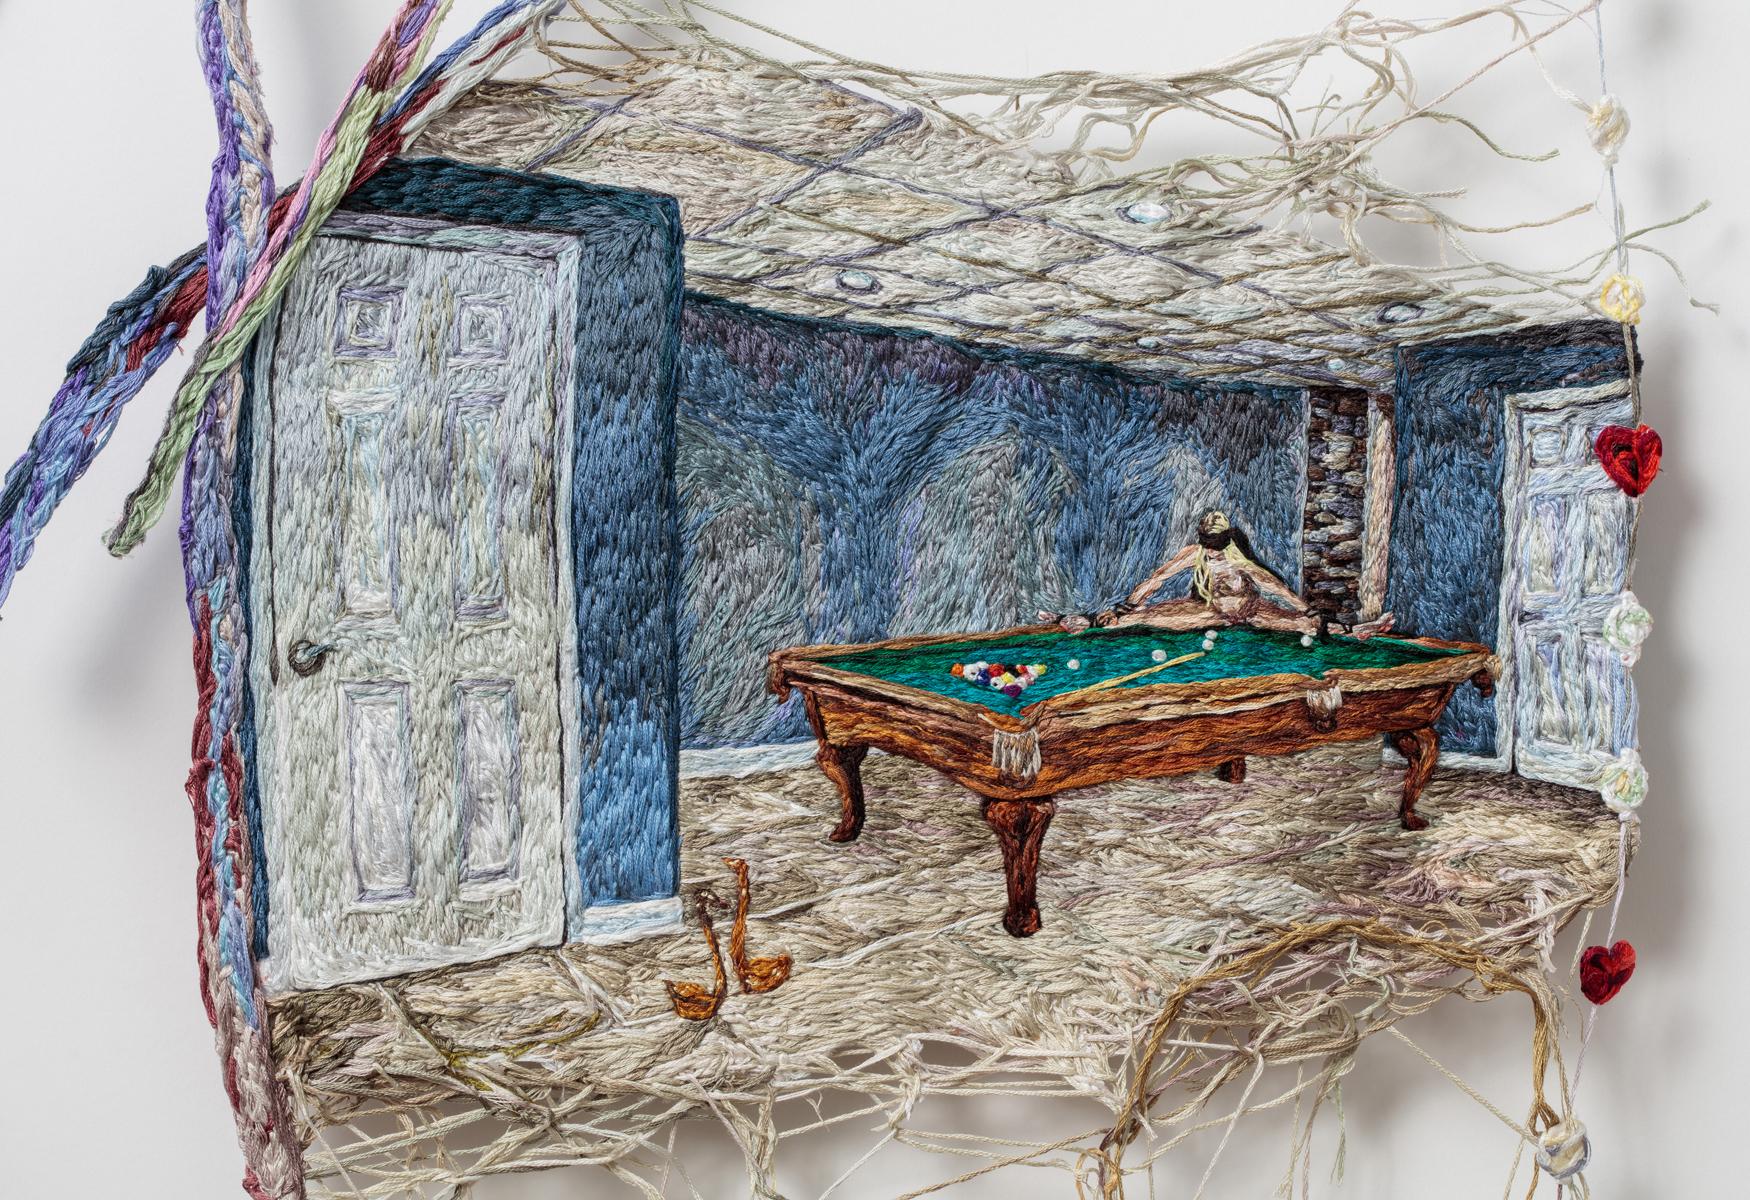 Waiting (detail), Sophia Narrett, 2015-2016, Embroidery Thread and Fabric, 26 x 48 inches .jpg